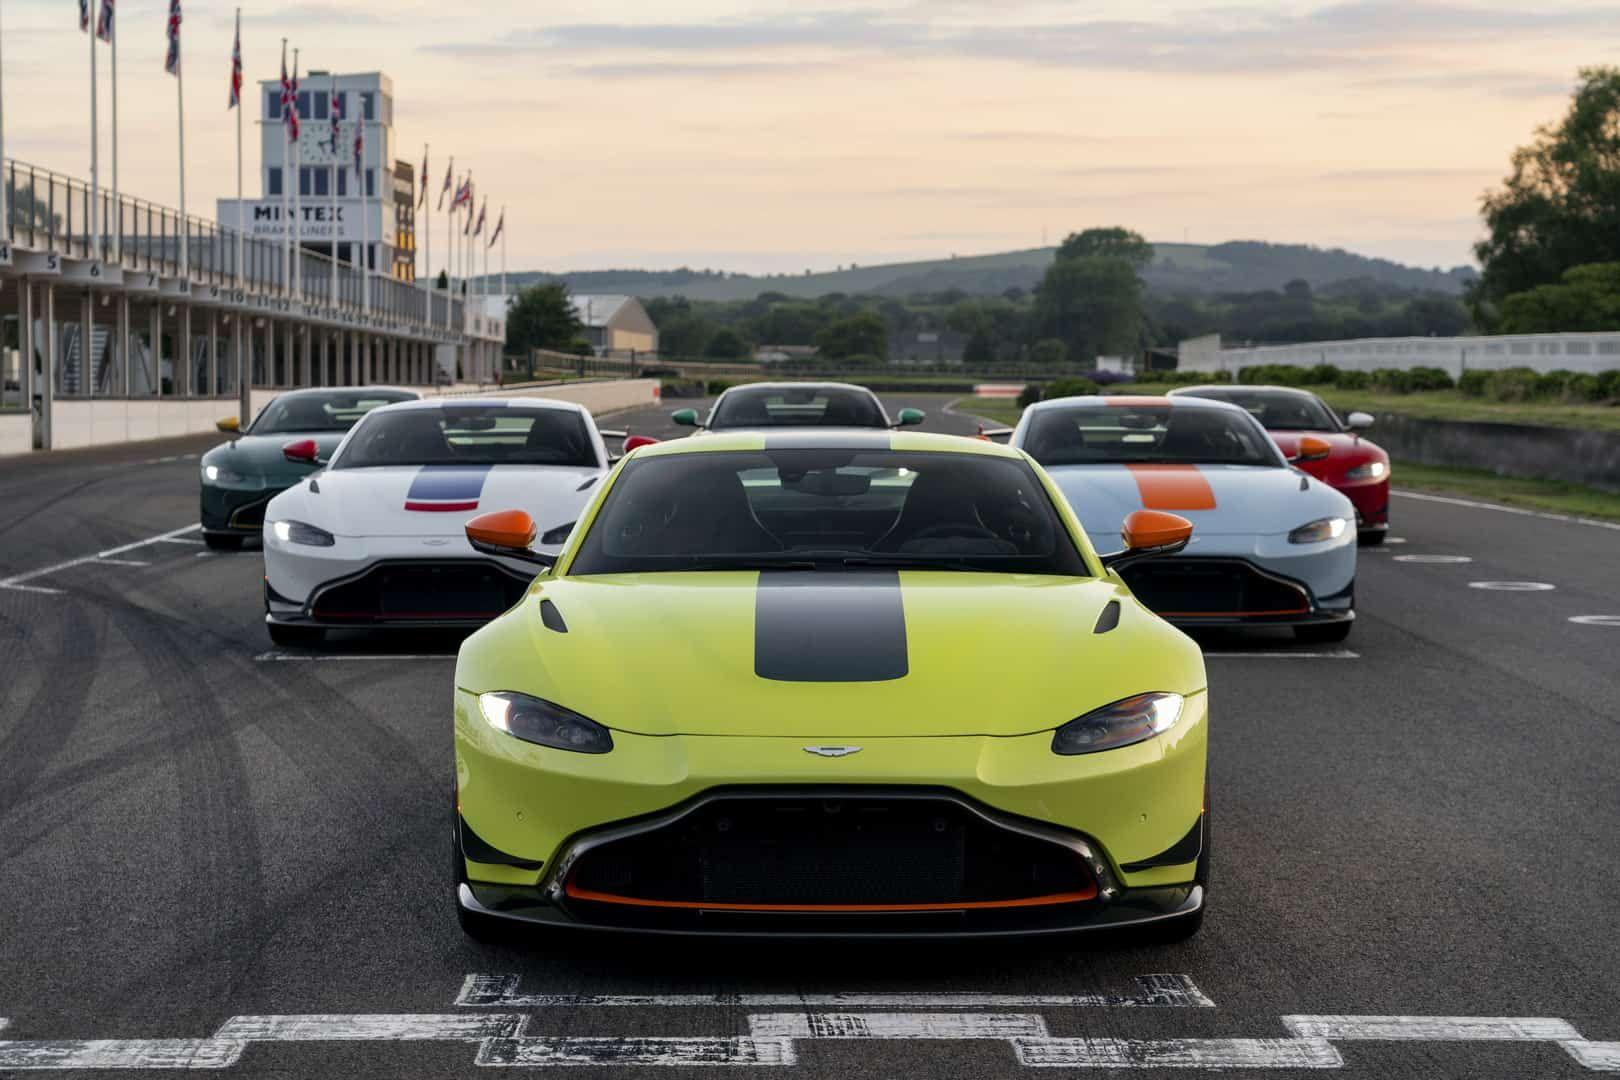 Aston Martin Unveiled The New Vantage Heritage Racing Editions Aston Martin Aston Martin Vantage Aston